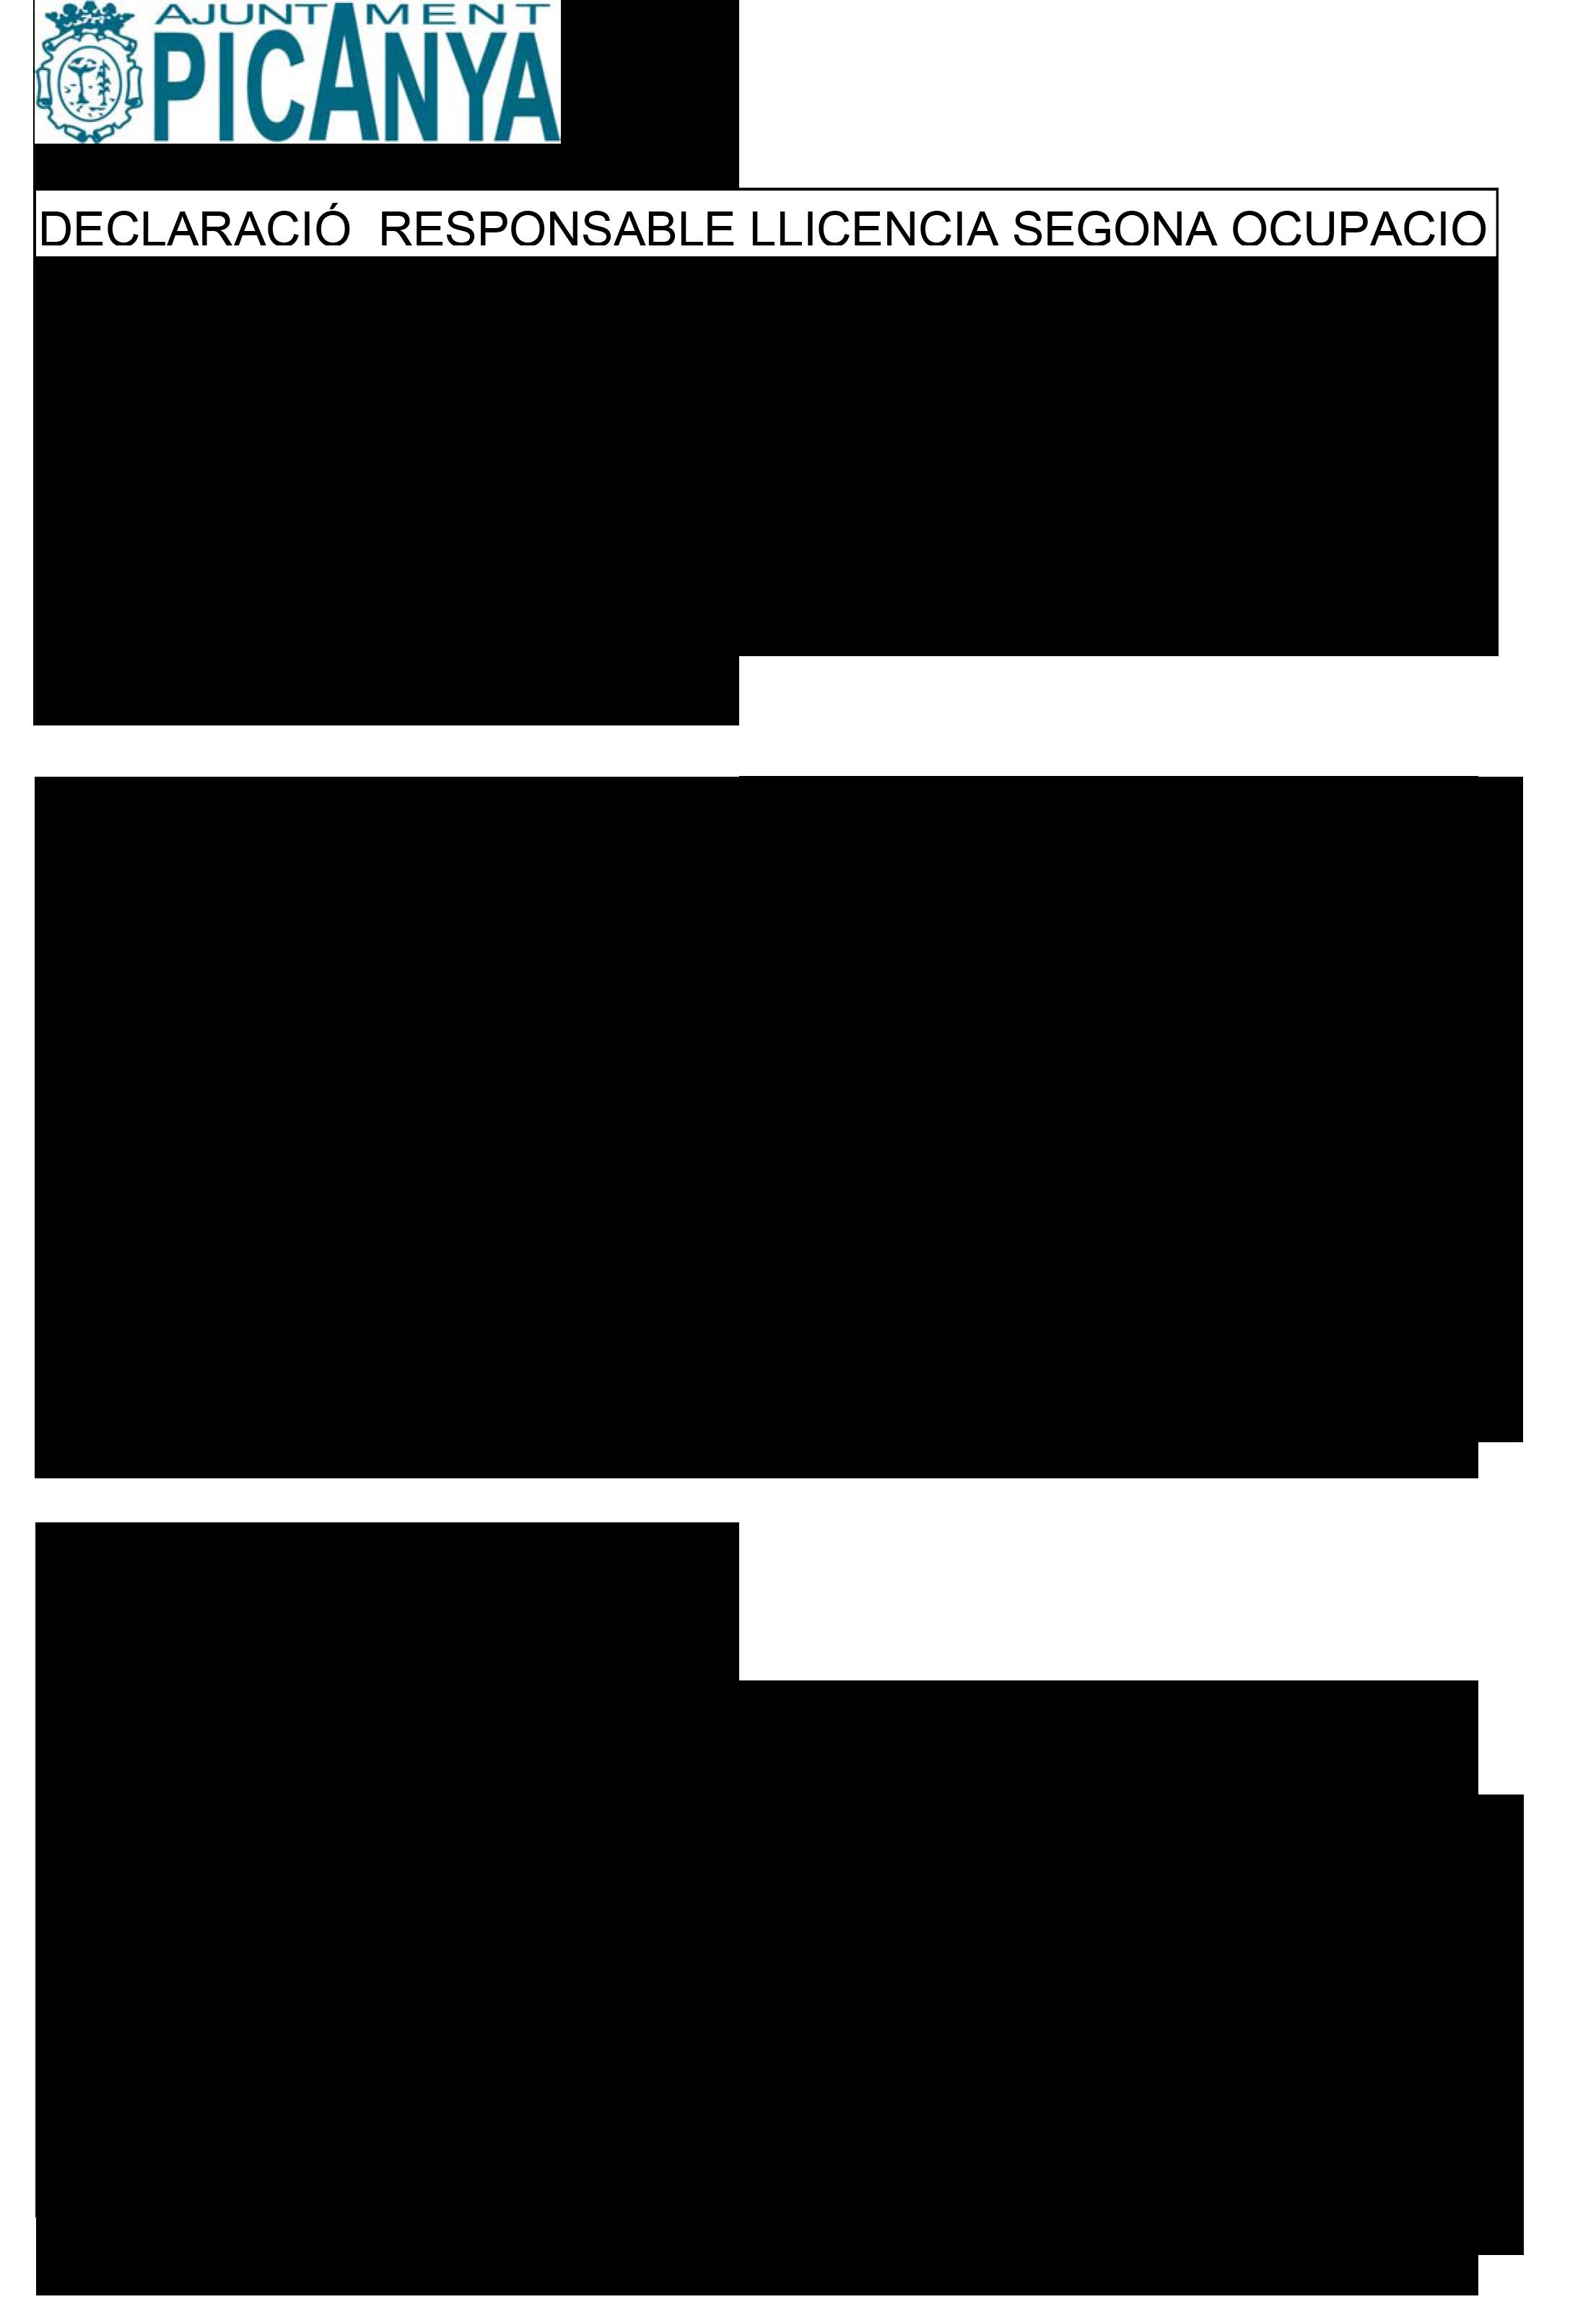 Impreso Declaración Responsable Segunda Ocupación - Picanya 1